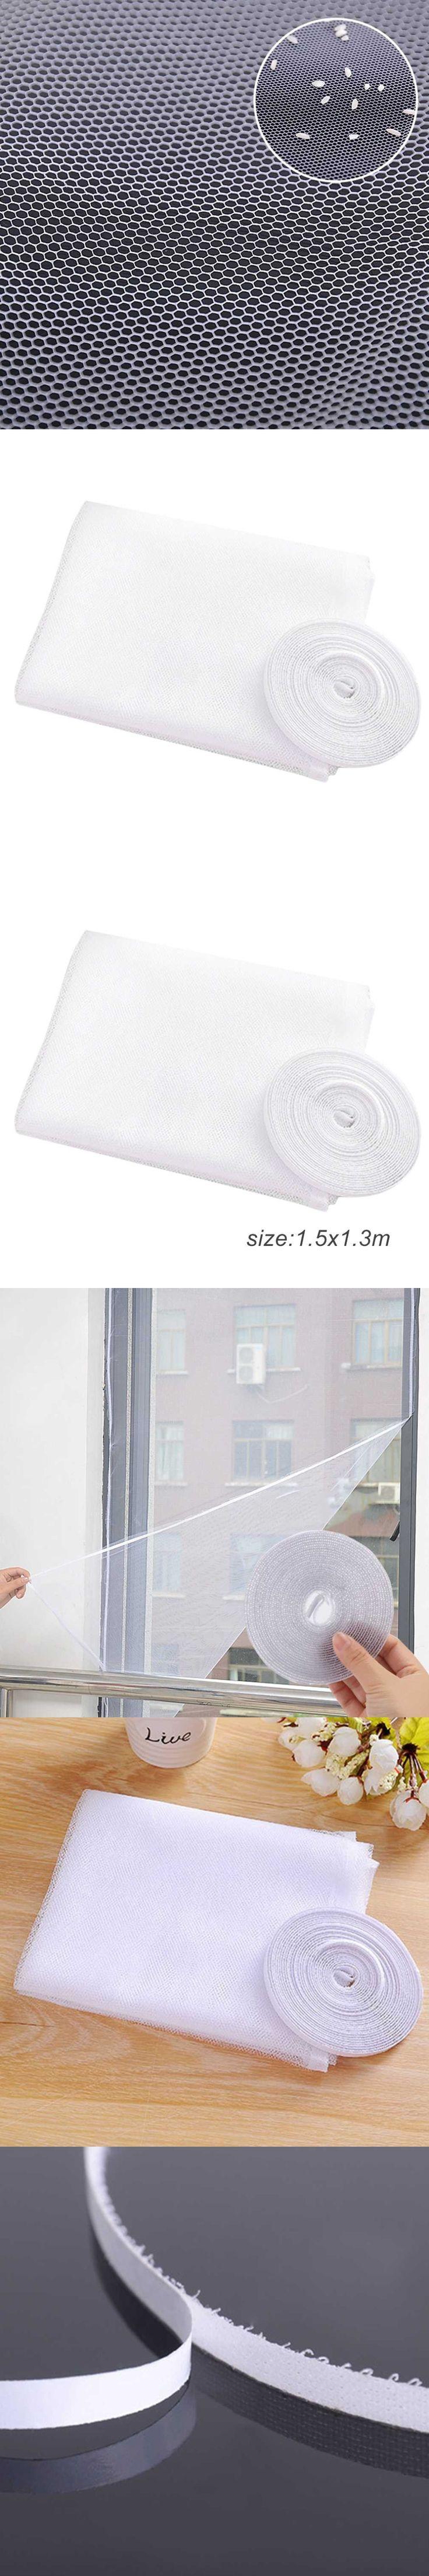 1.5*1.3 M Window Door Screen DIY Flyscreen Curtain Insect Screen Fly Mosquito Bug Window Door Mesh Screens Home Kitchen Use